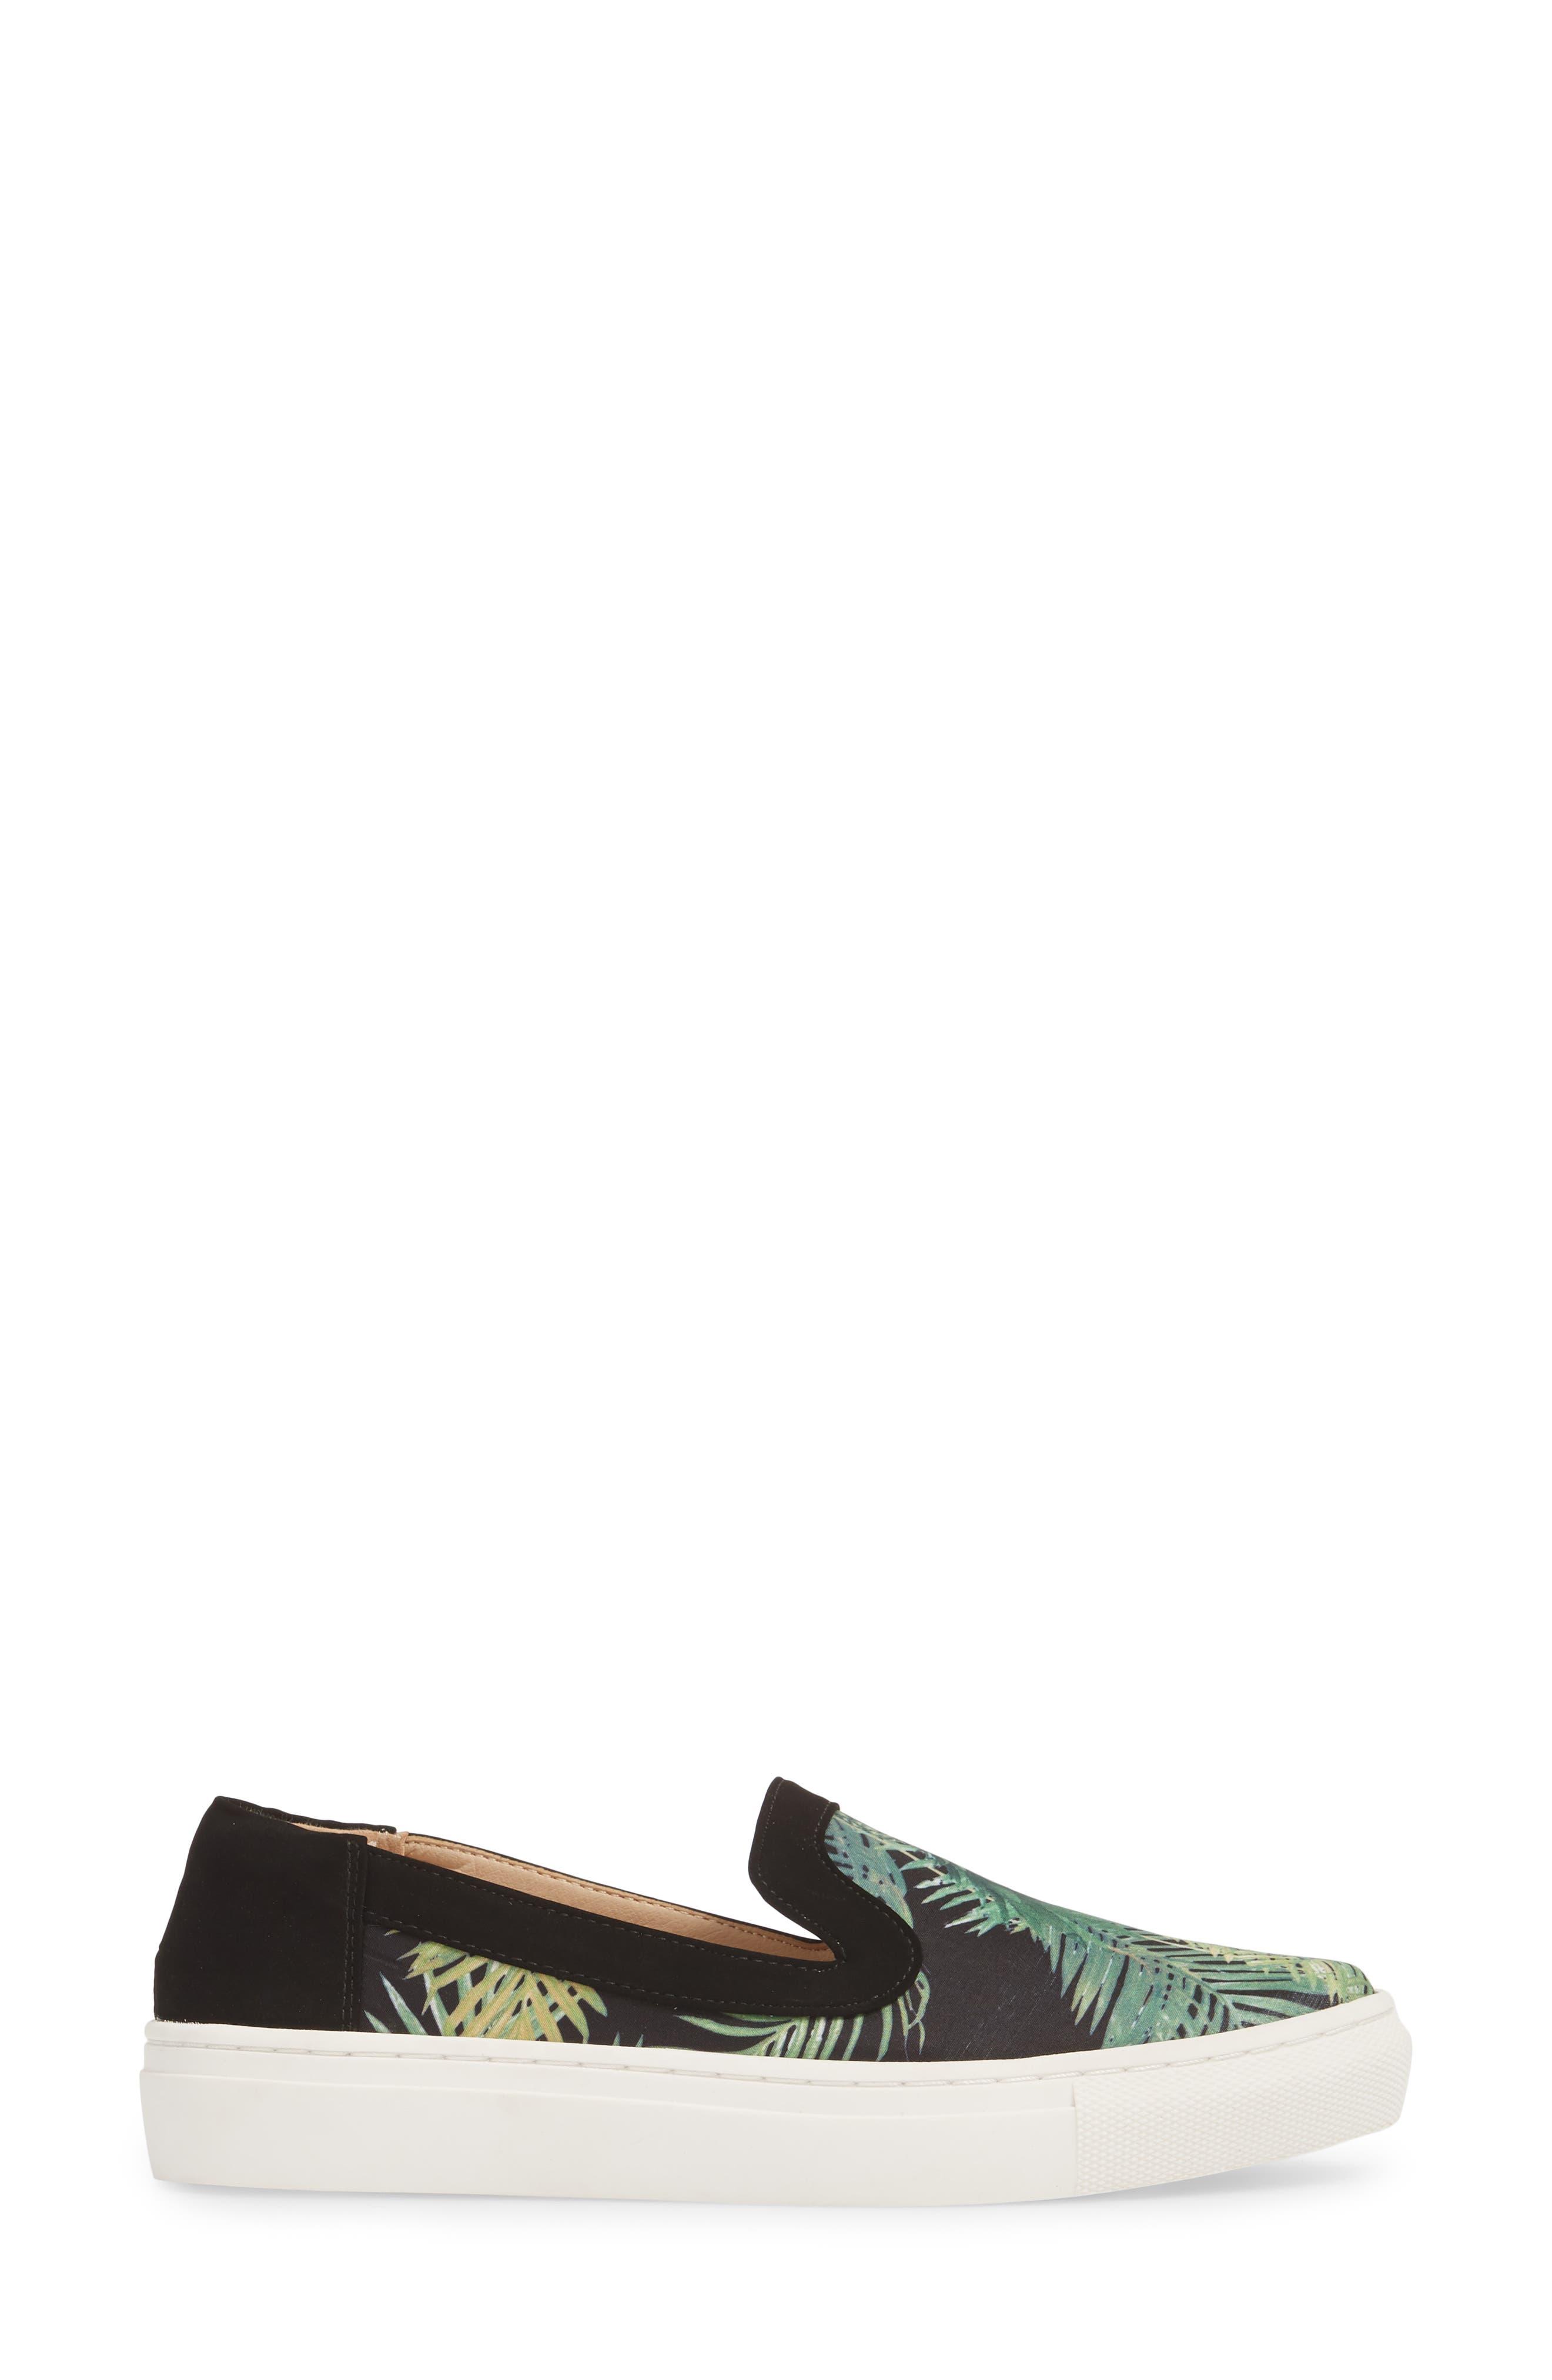 Lineth Sneaker,                             Alternate thumbnail 3, color,                             BLACK / MULTI